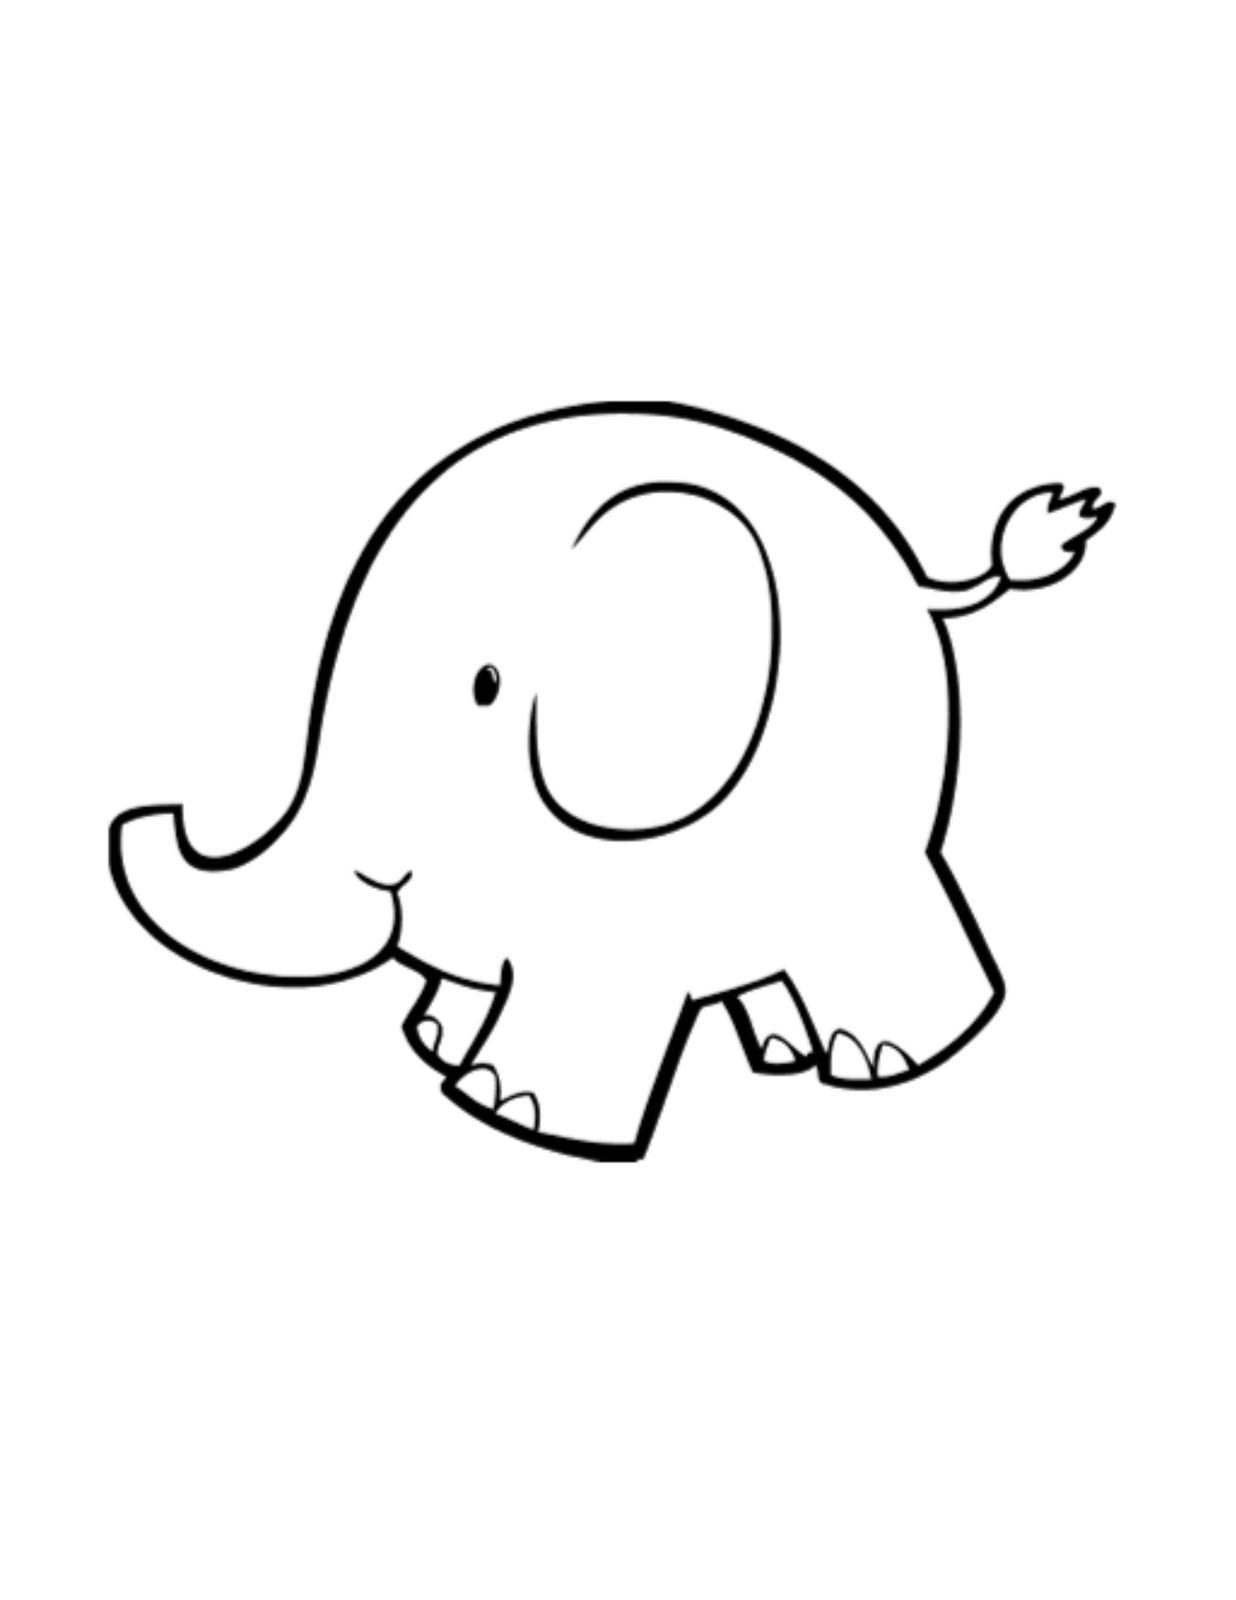 elephant face clipart outline - photo #19